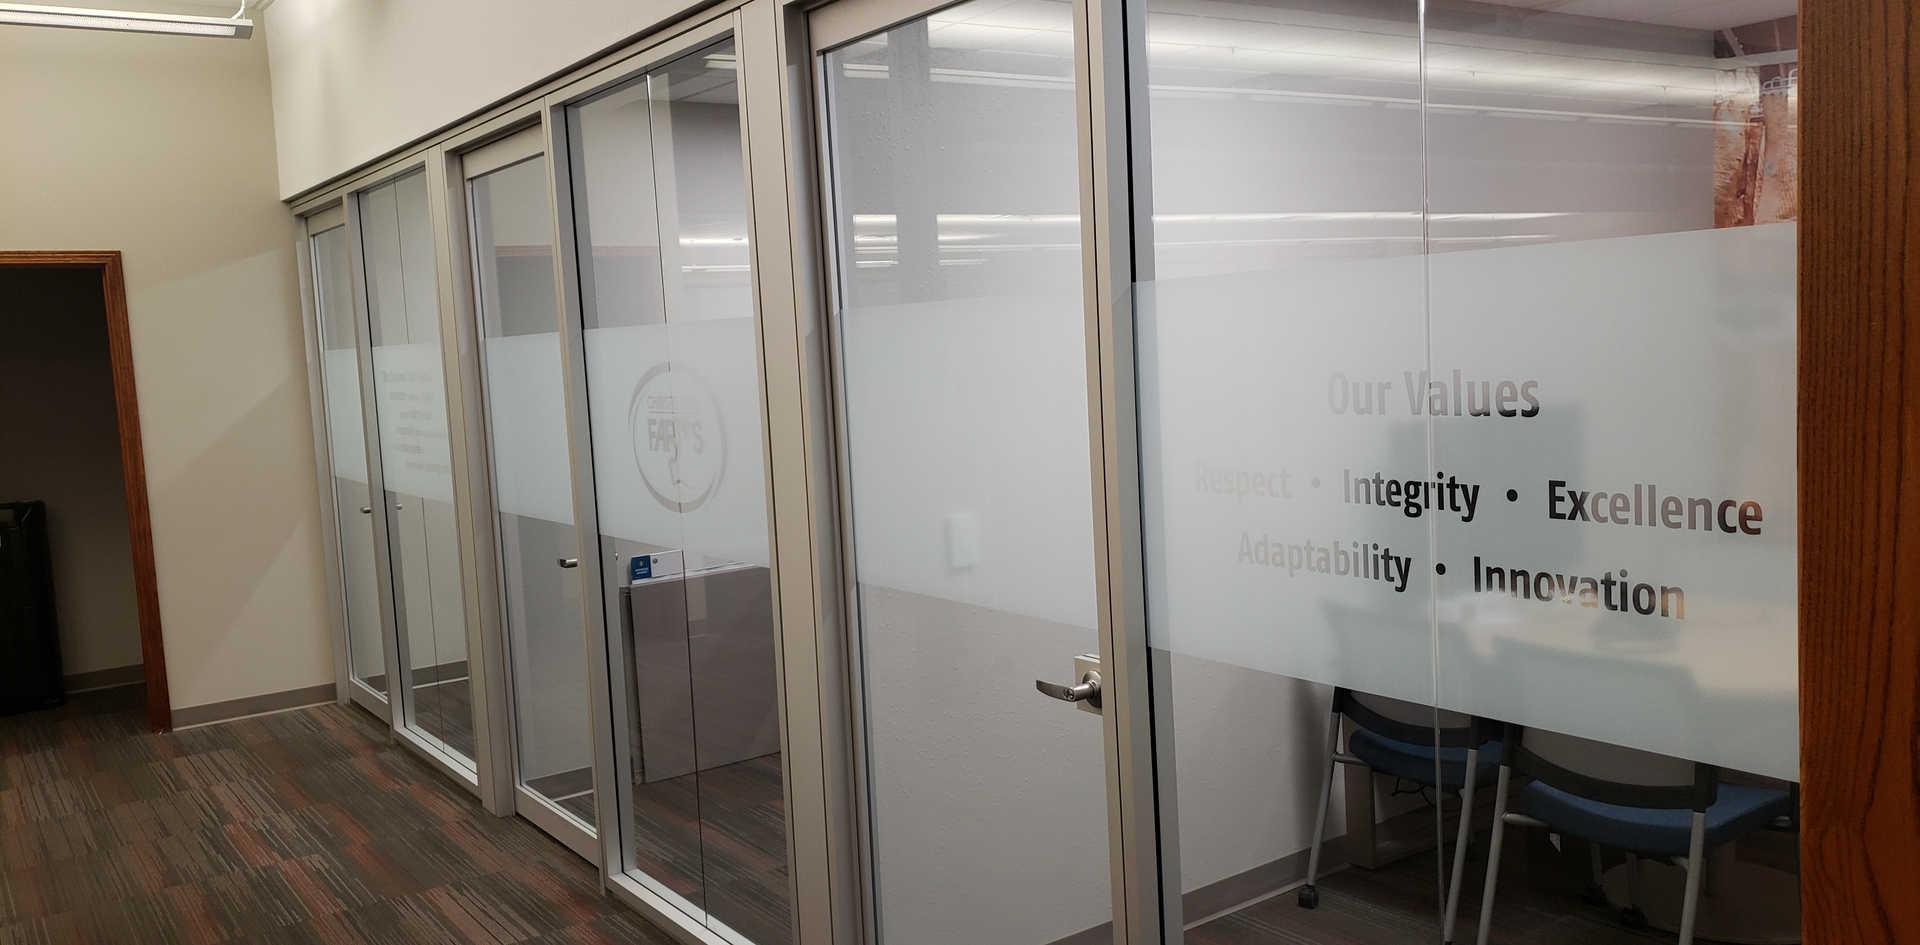 Christensen Farms: Meeting Room Window Frost